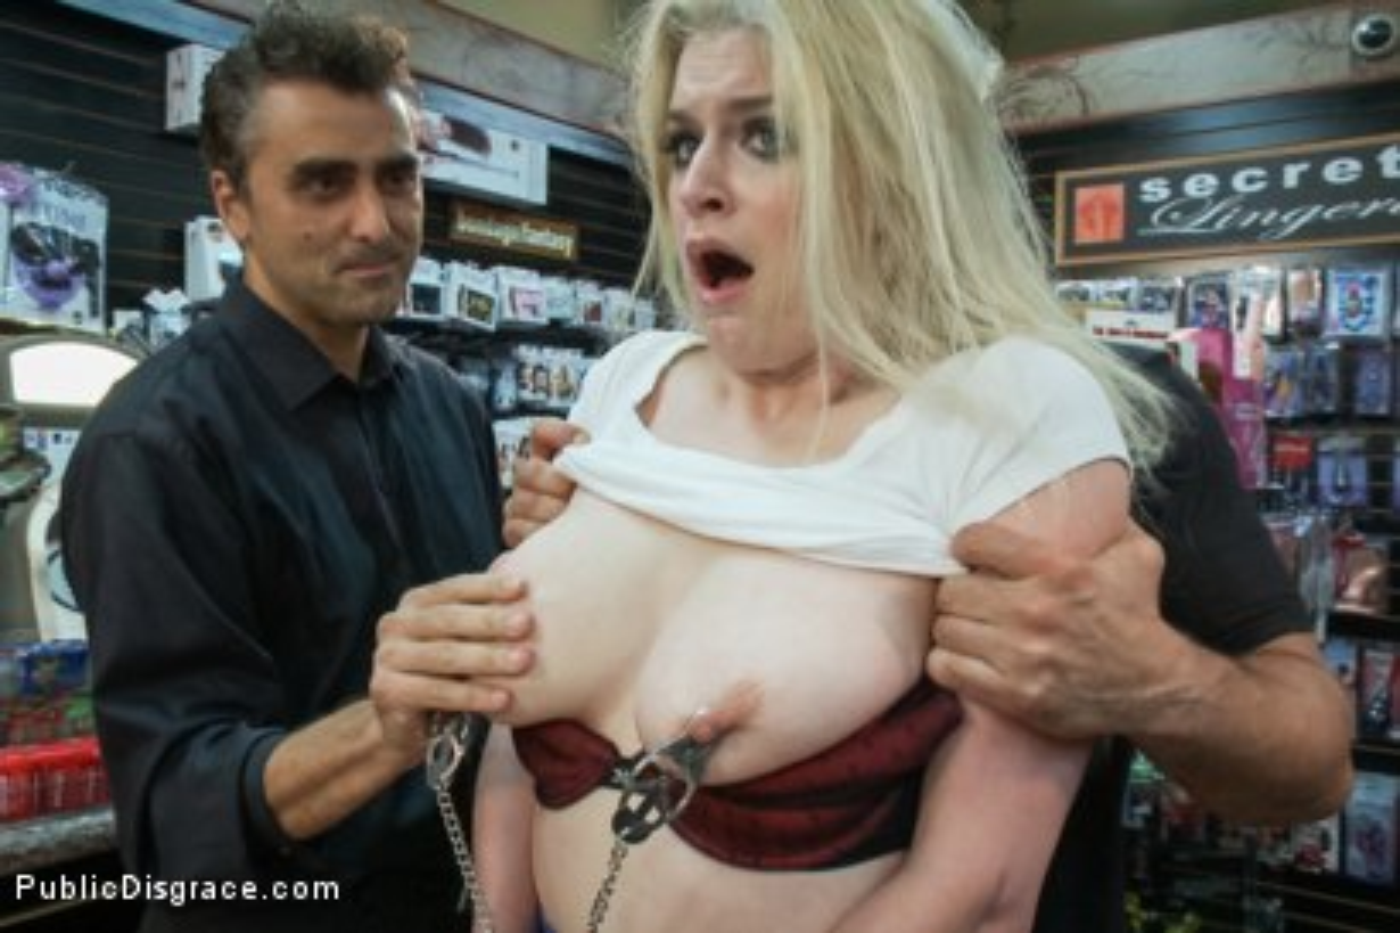 Regret, Public disgrace blonde in sex shop